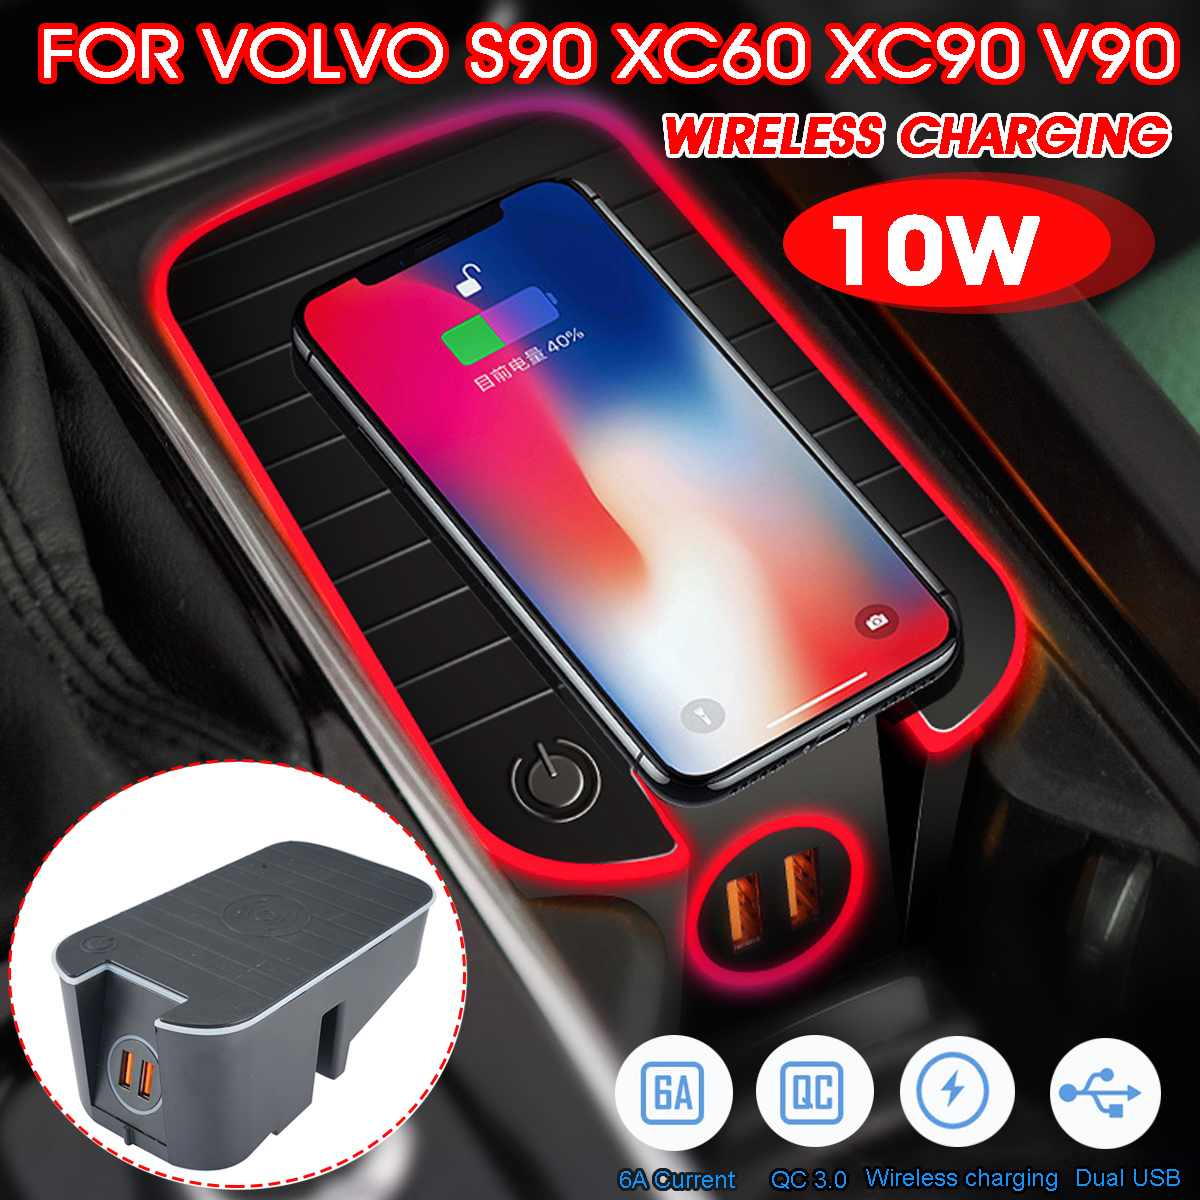 Audew para Volvo S90 XC60 XC90 V90 QI cargador de coche inalámbrico teléfono de coche almohadilla de carga rápida coche Control Central alfombrilla antideslizante